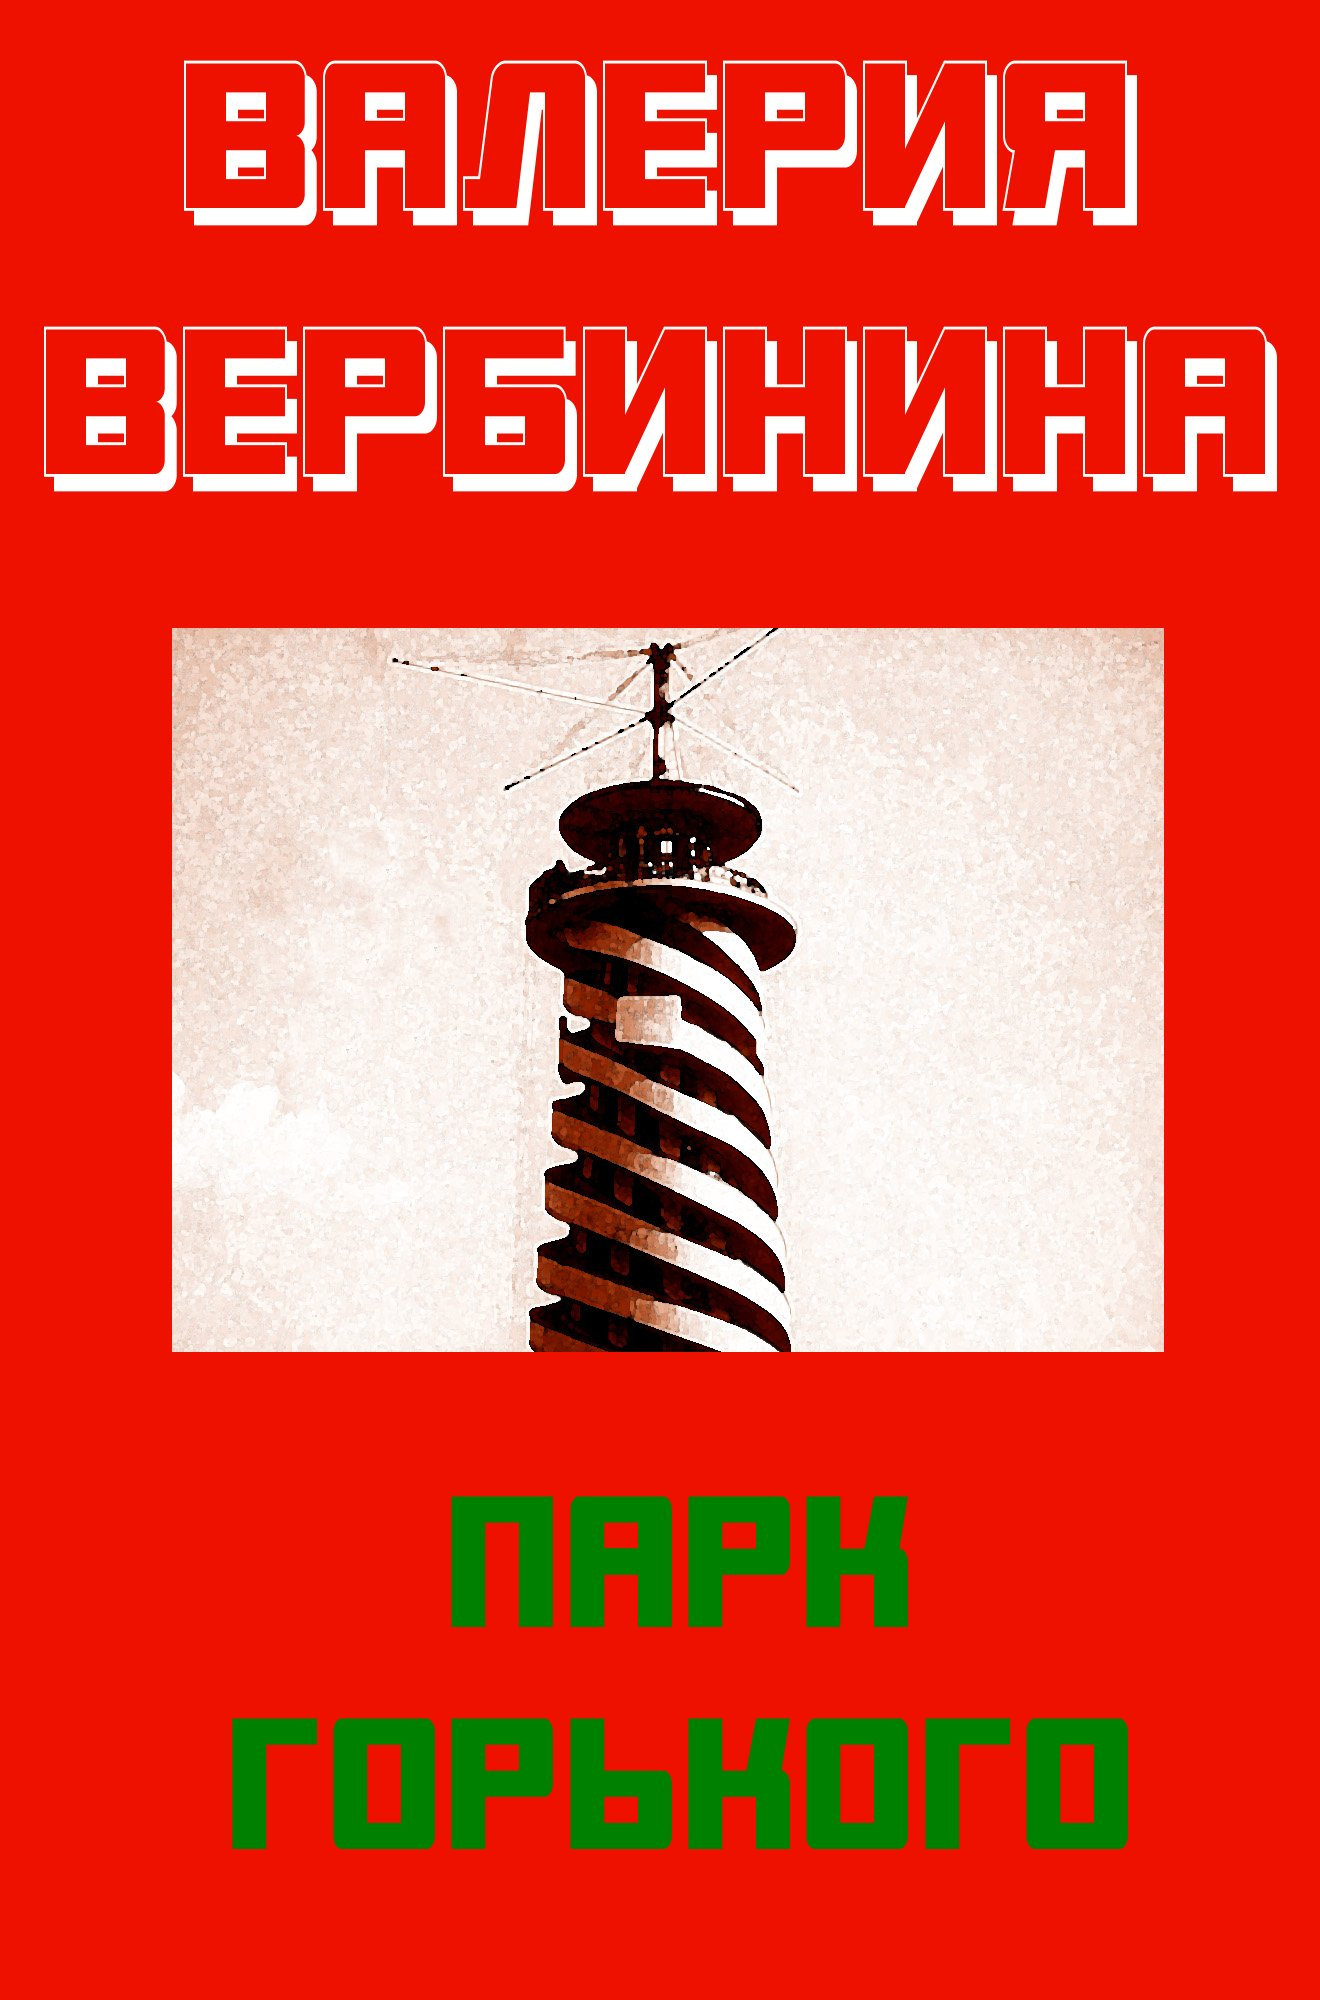 Валерия Вербинина, Валерия Вербинина - Парк Горького